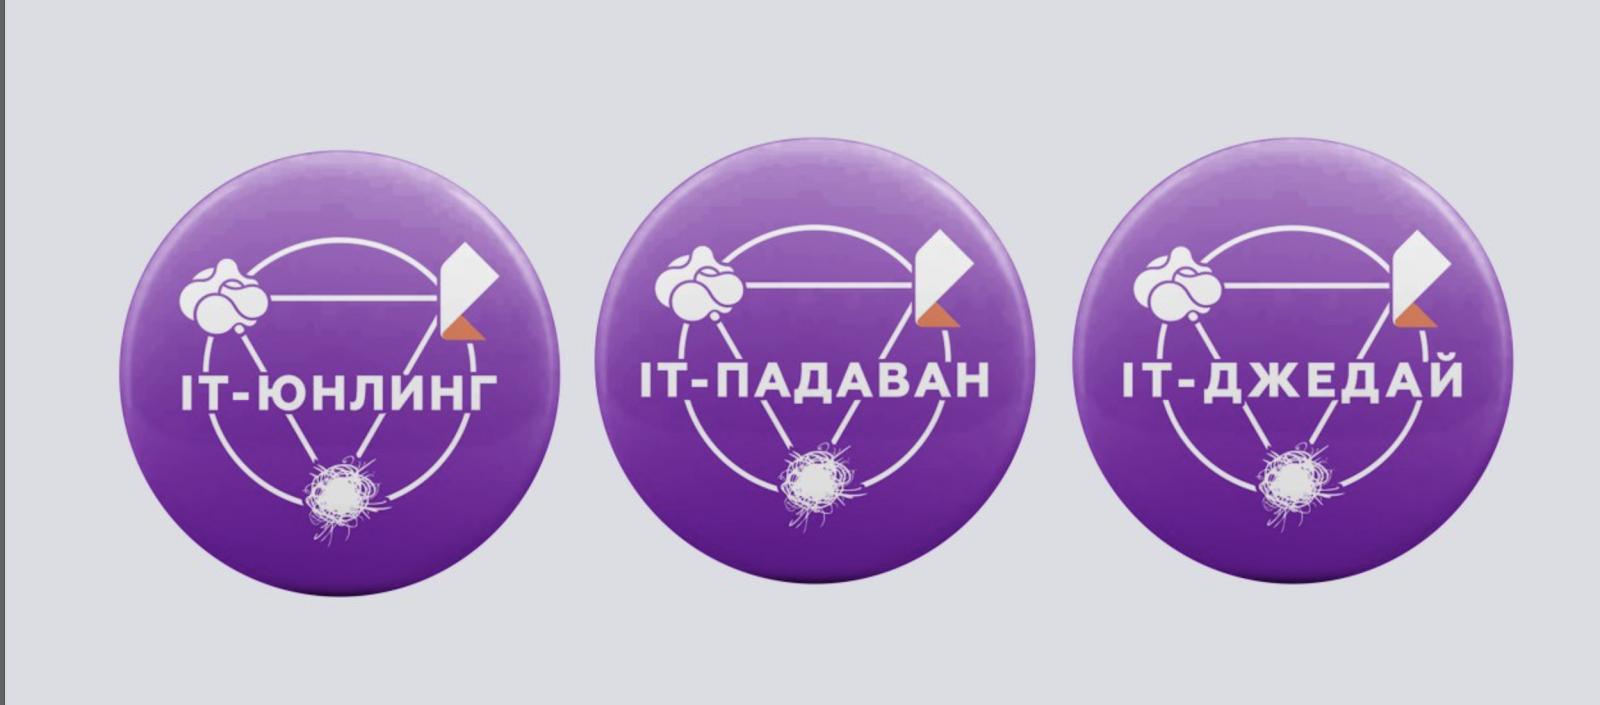 Инициация IT-адептов: покажи свою Силу на РИФе - 4